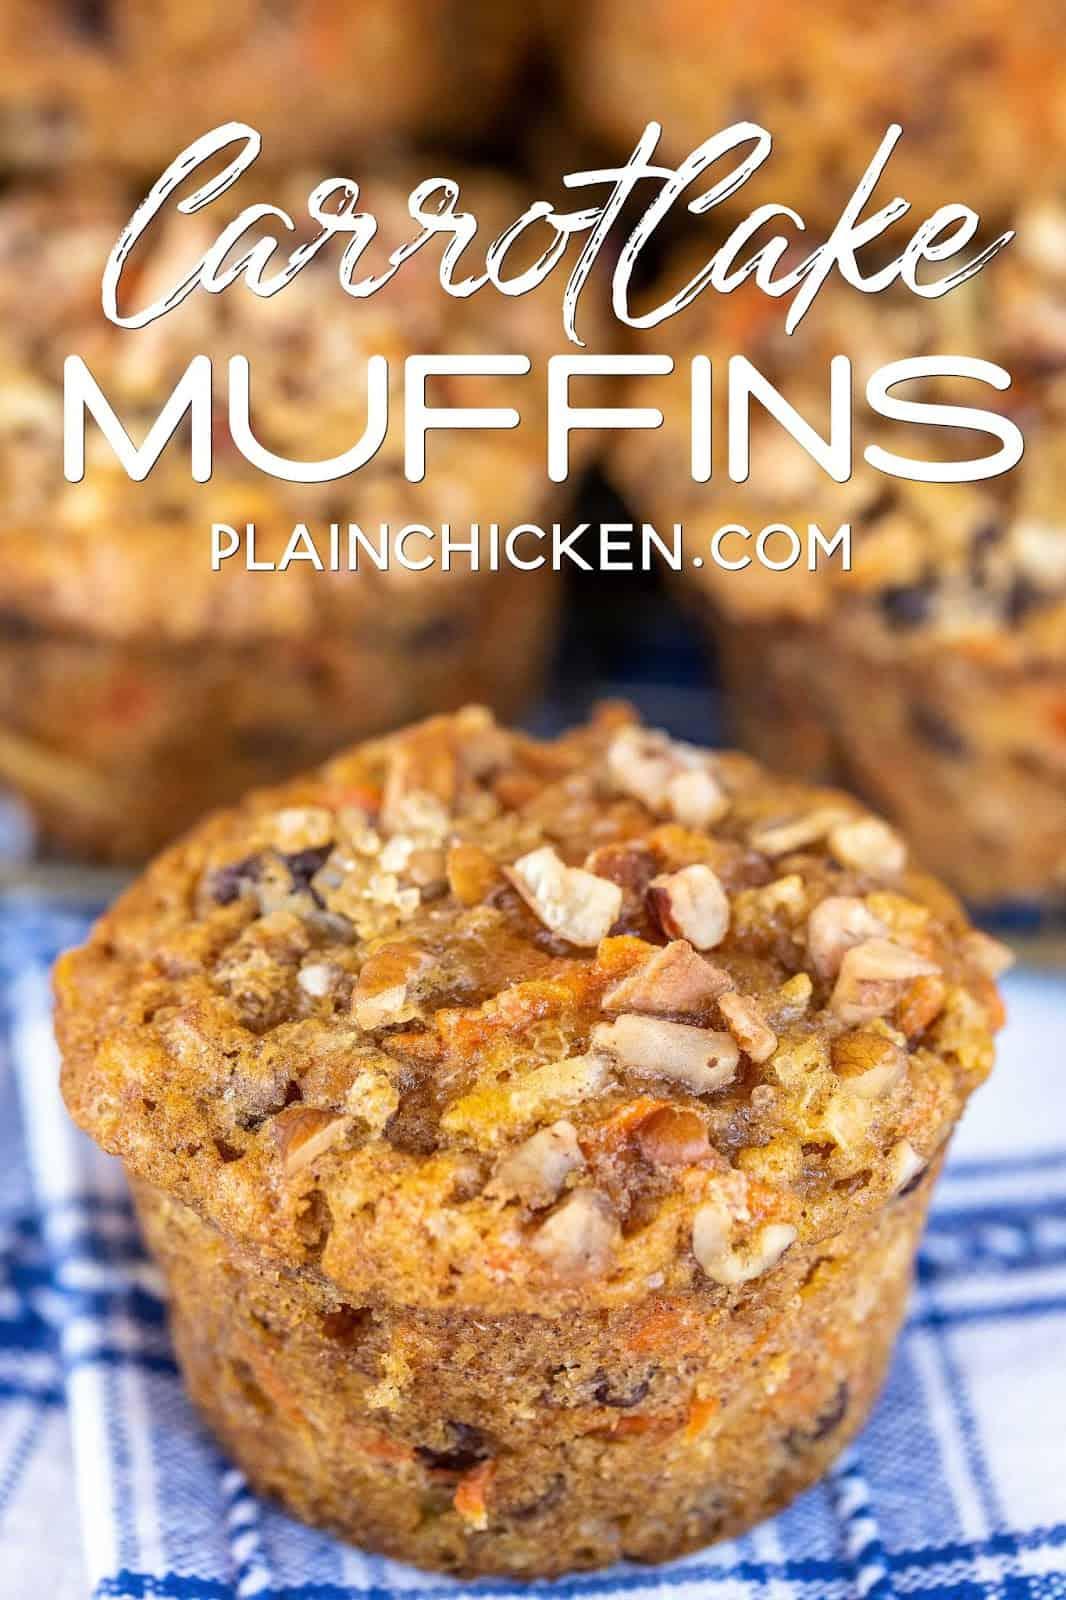 Carrot Cake Muffins Plain Chicken